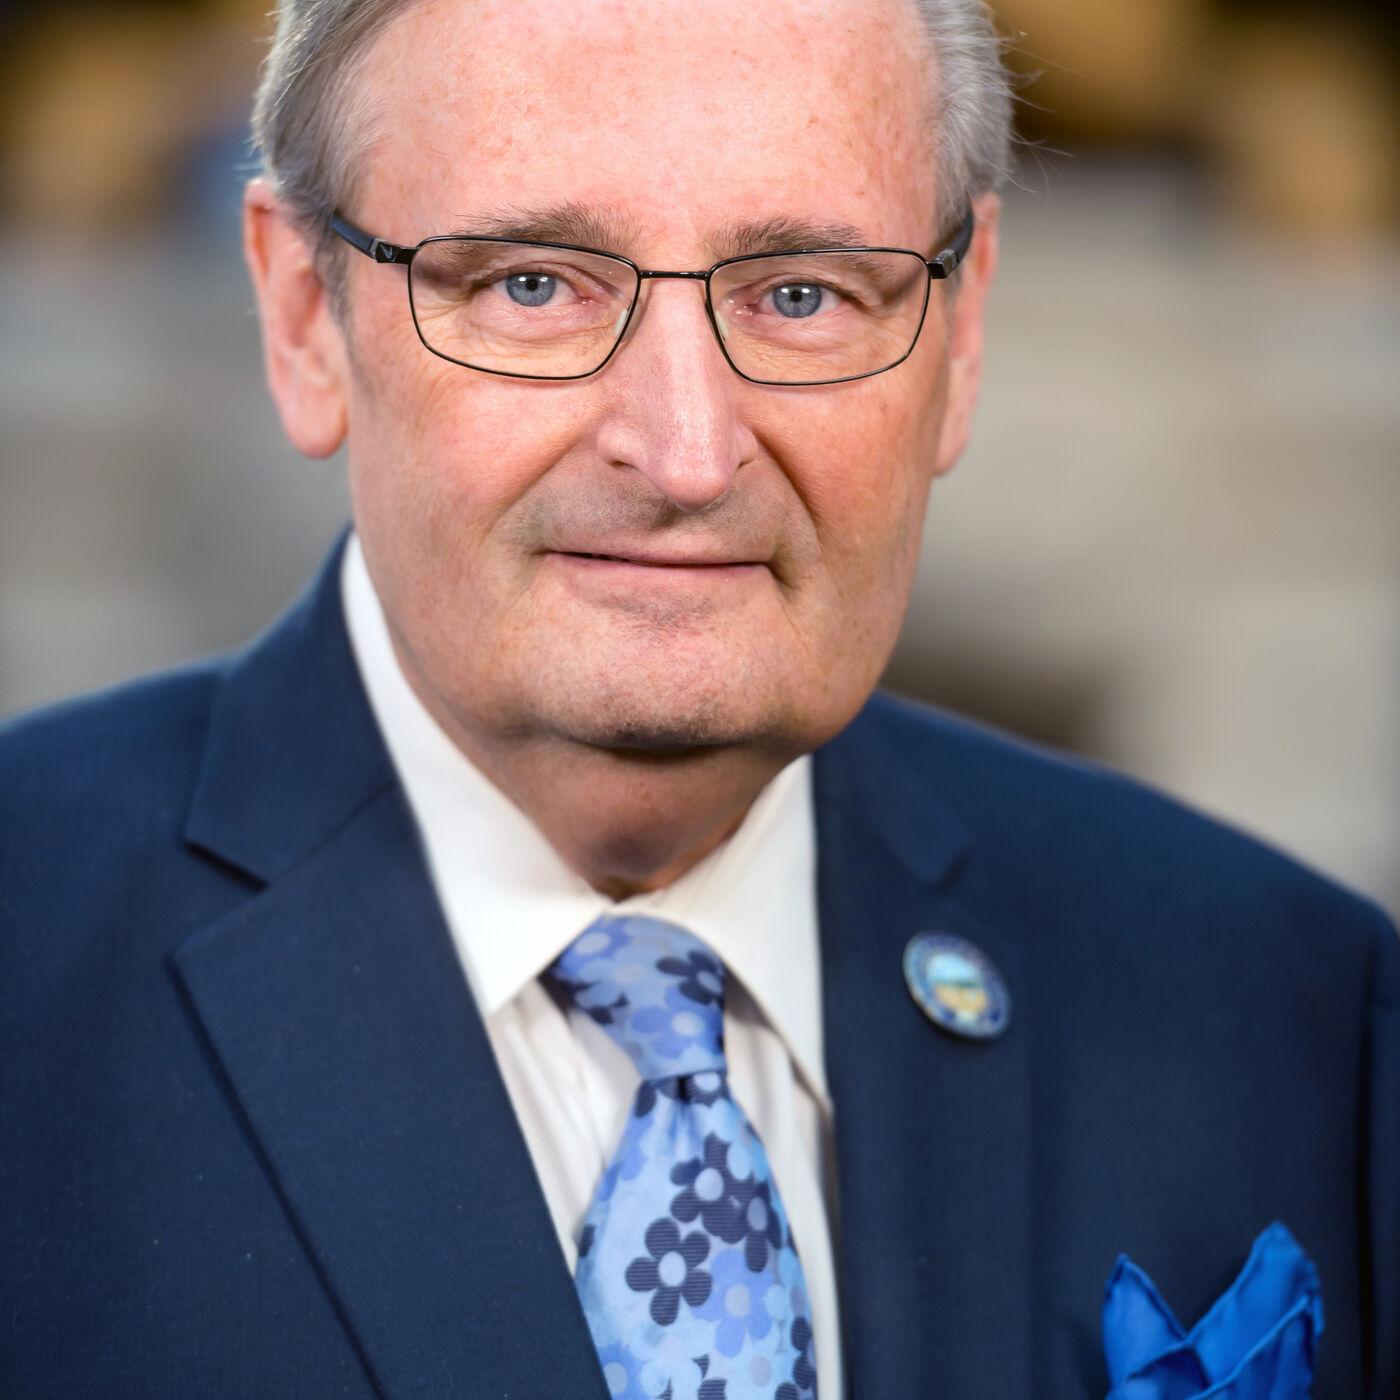 Ep. 36 - Ohio Senator, Kenny Yuko (D - District 25)